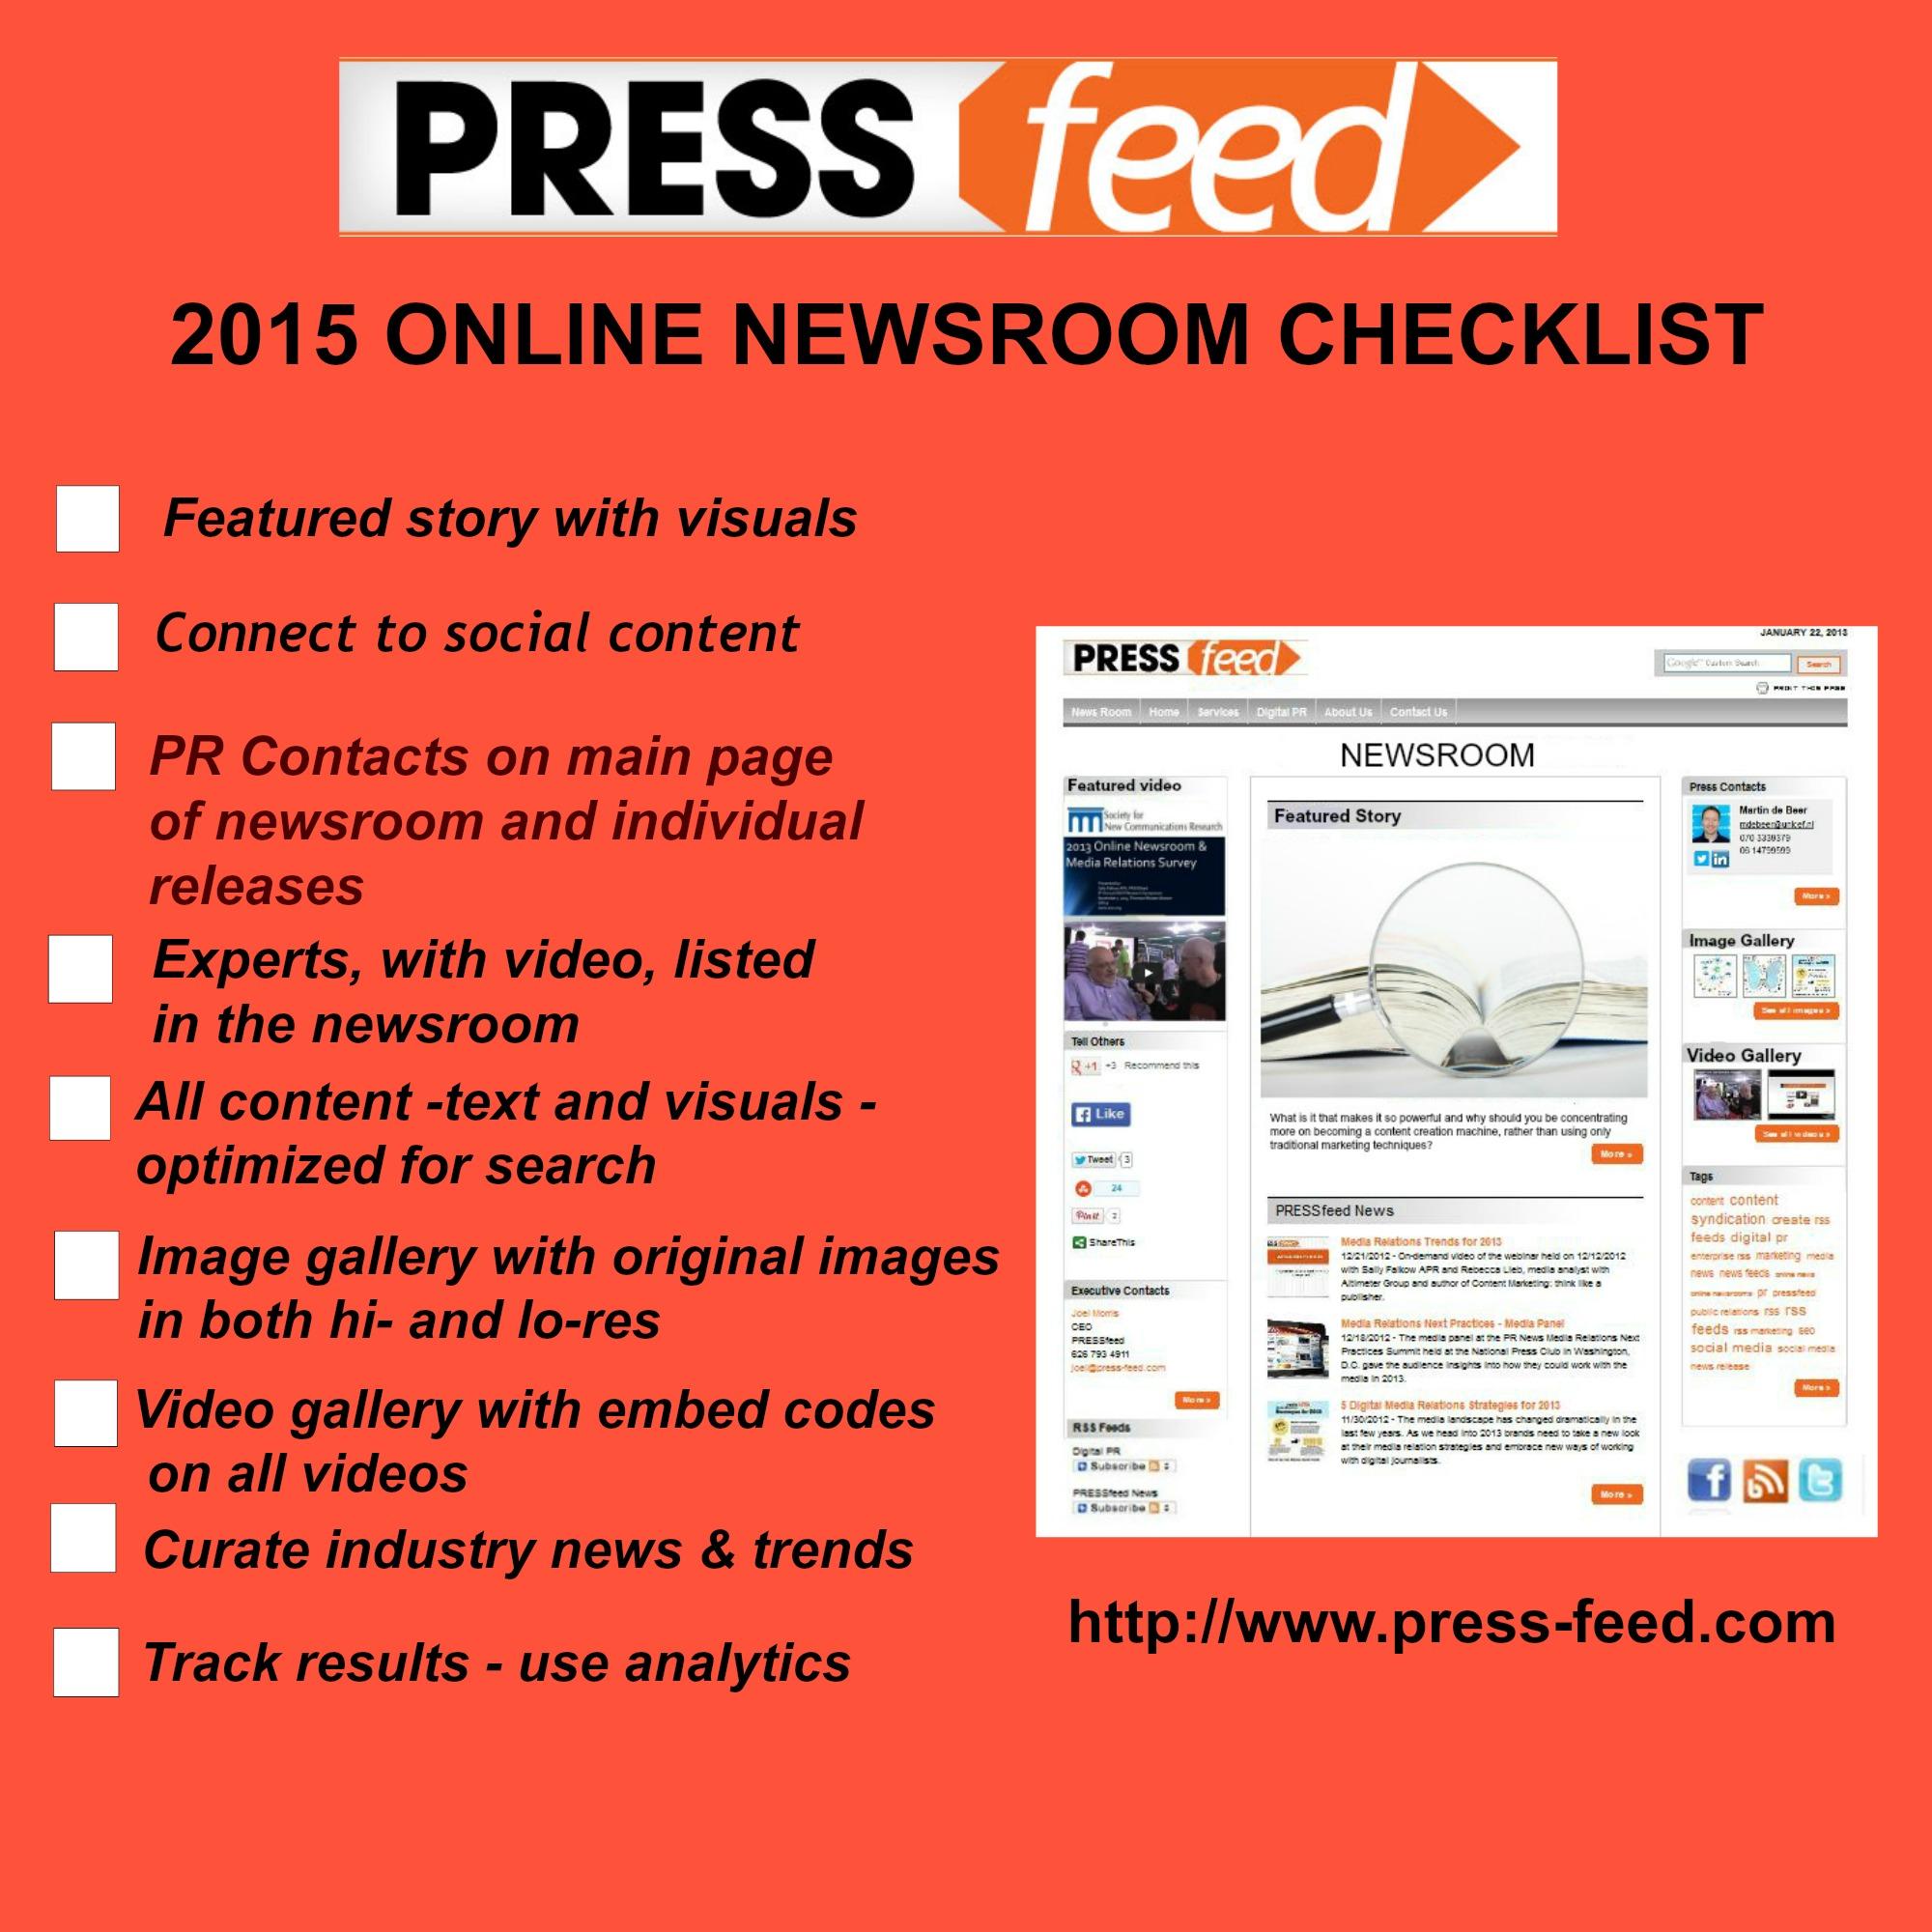 online newsroom checklist